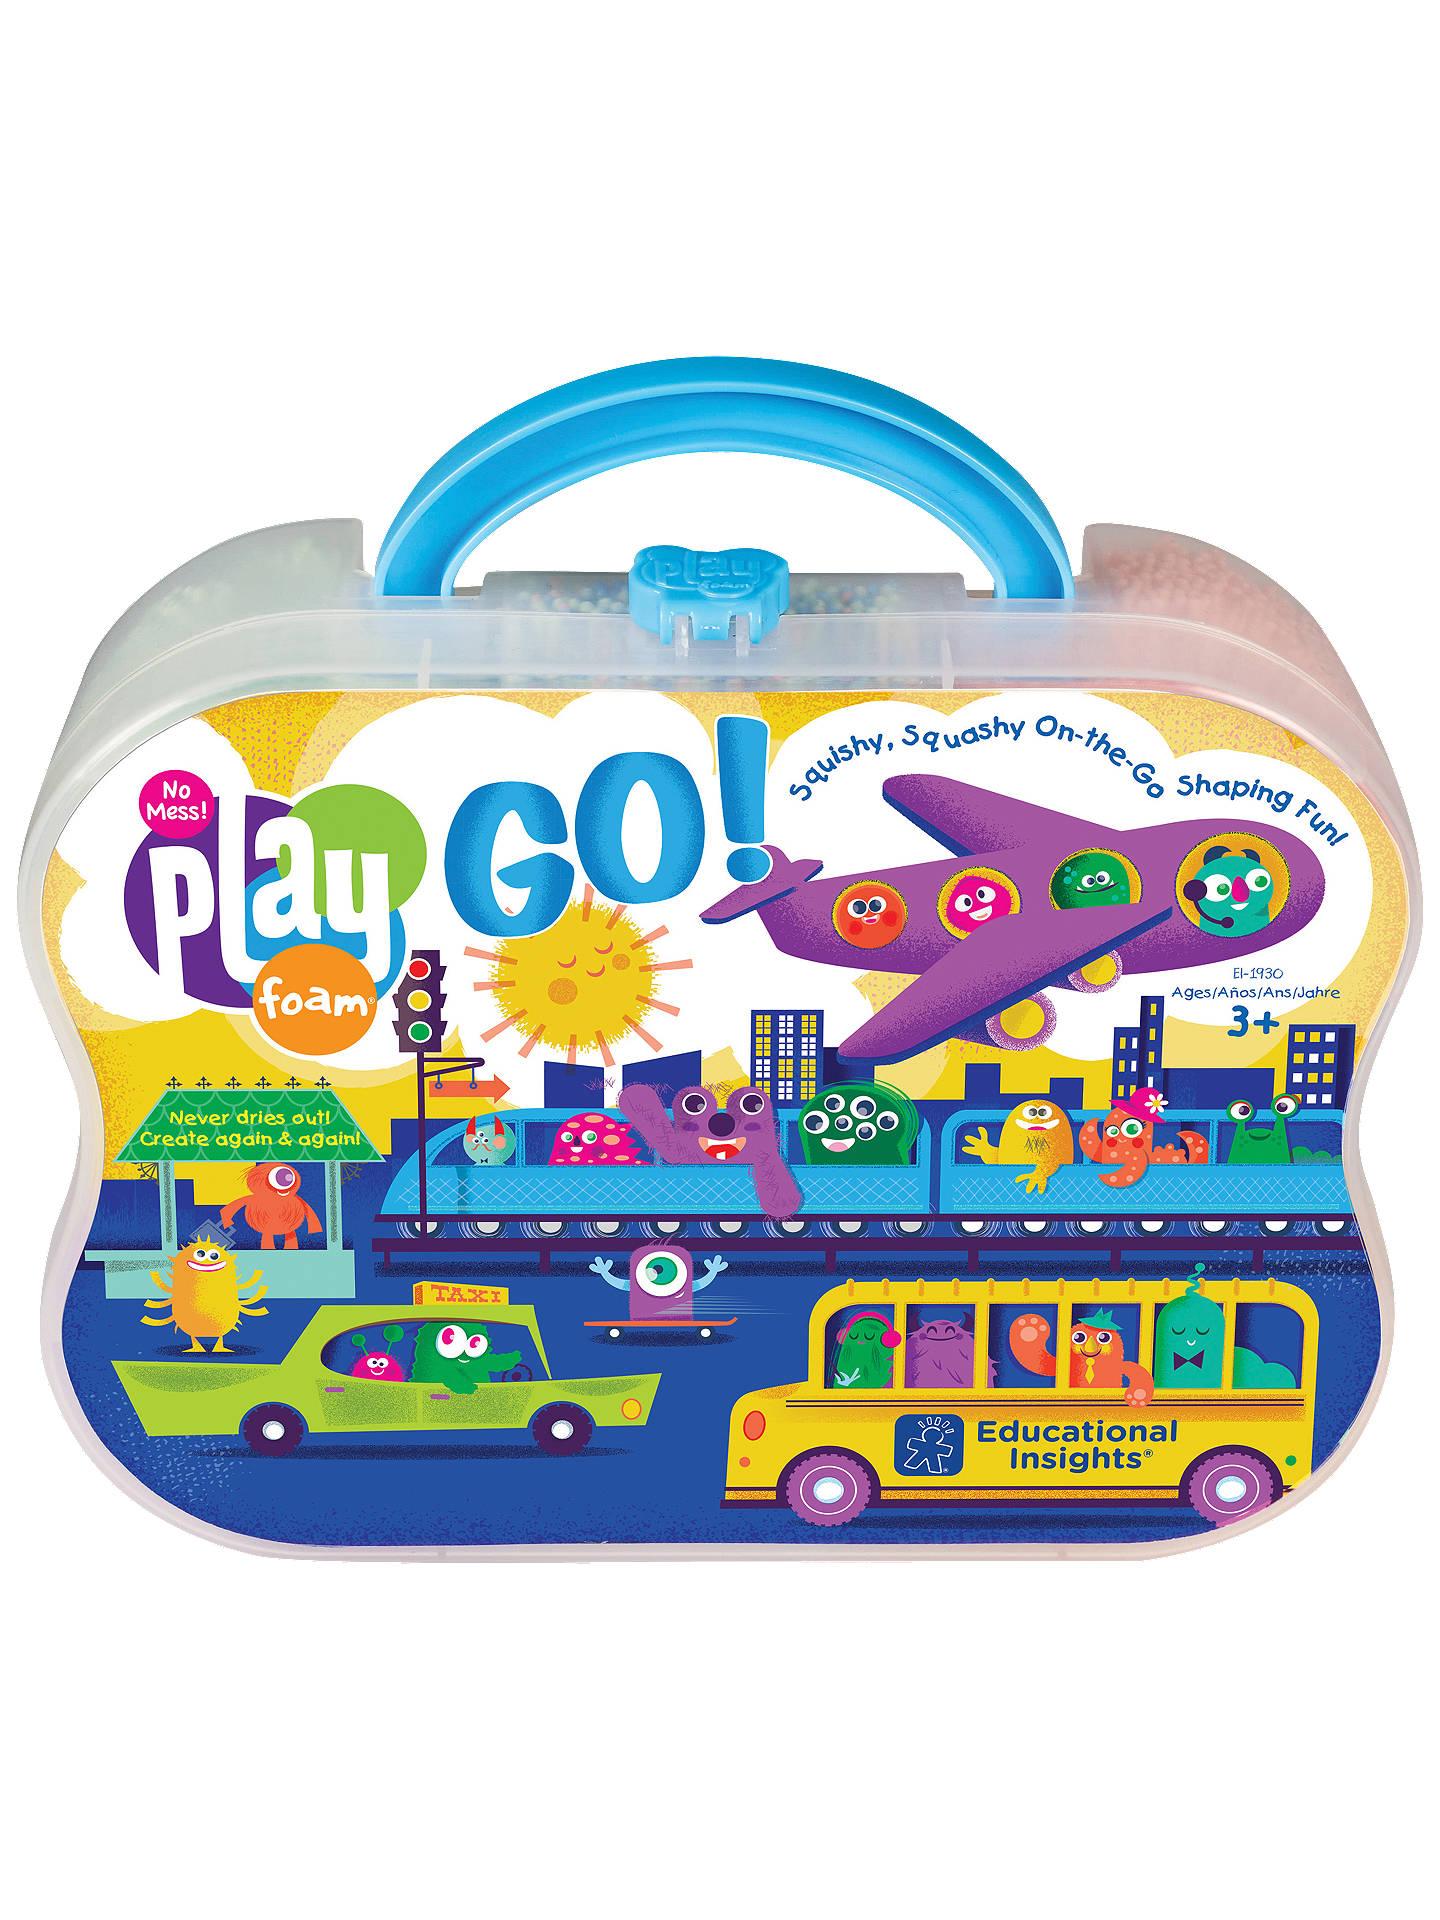 Travel Sized Sensory Toy EI-1930 Educational Insights Playfoam Go